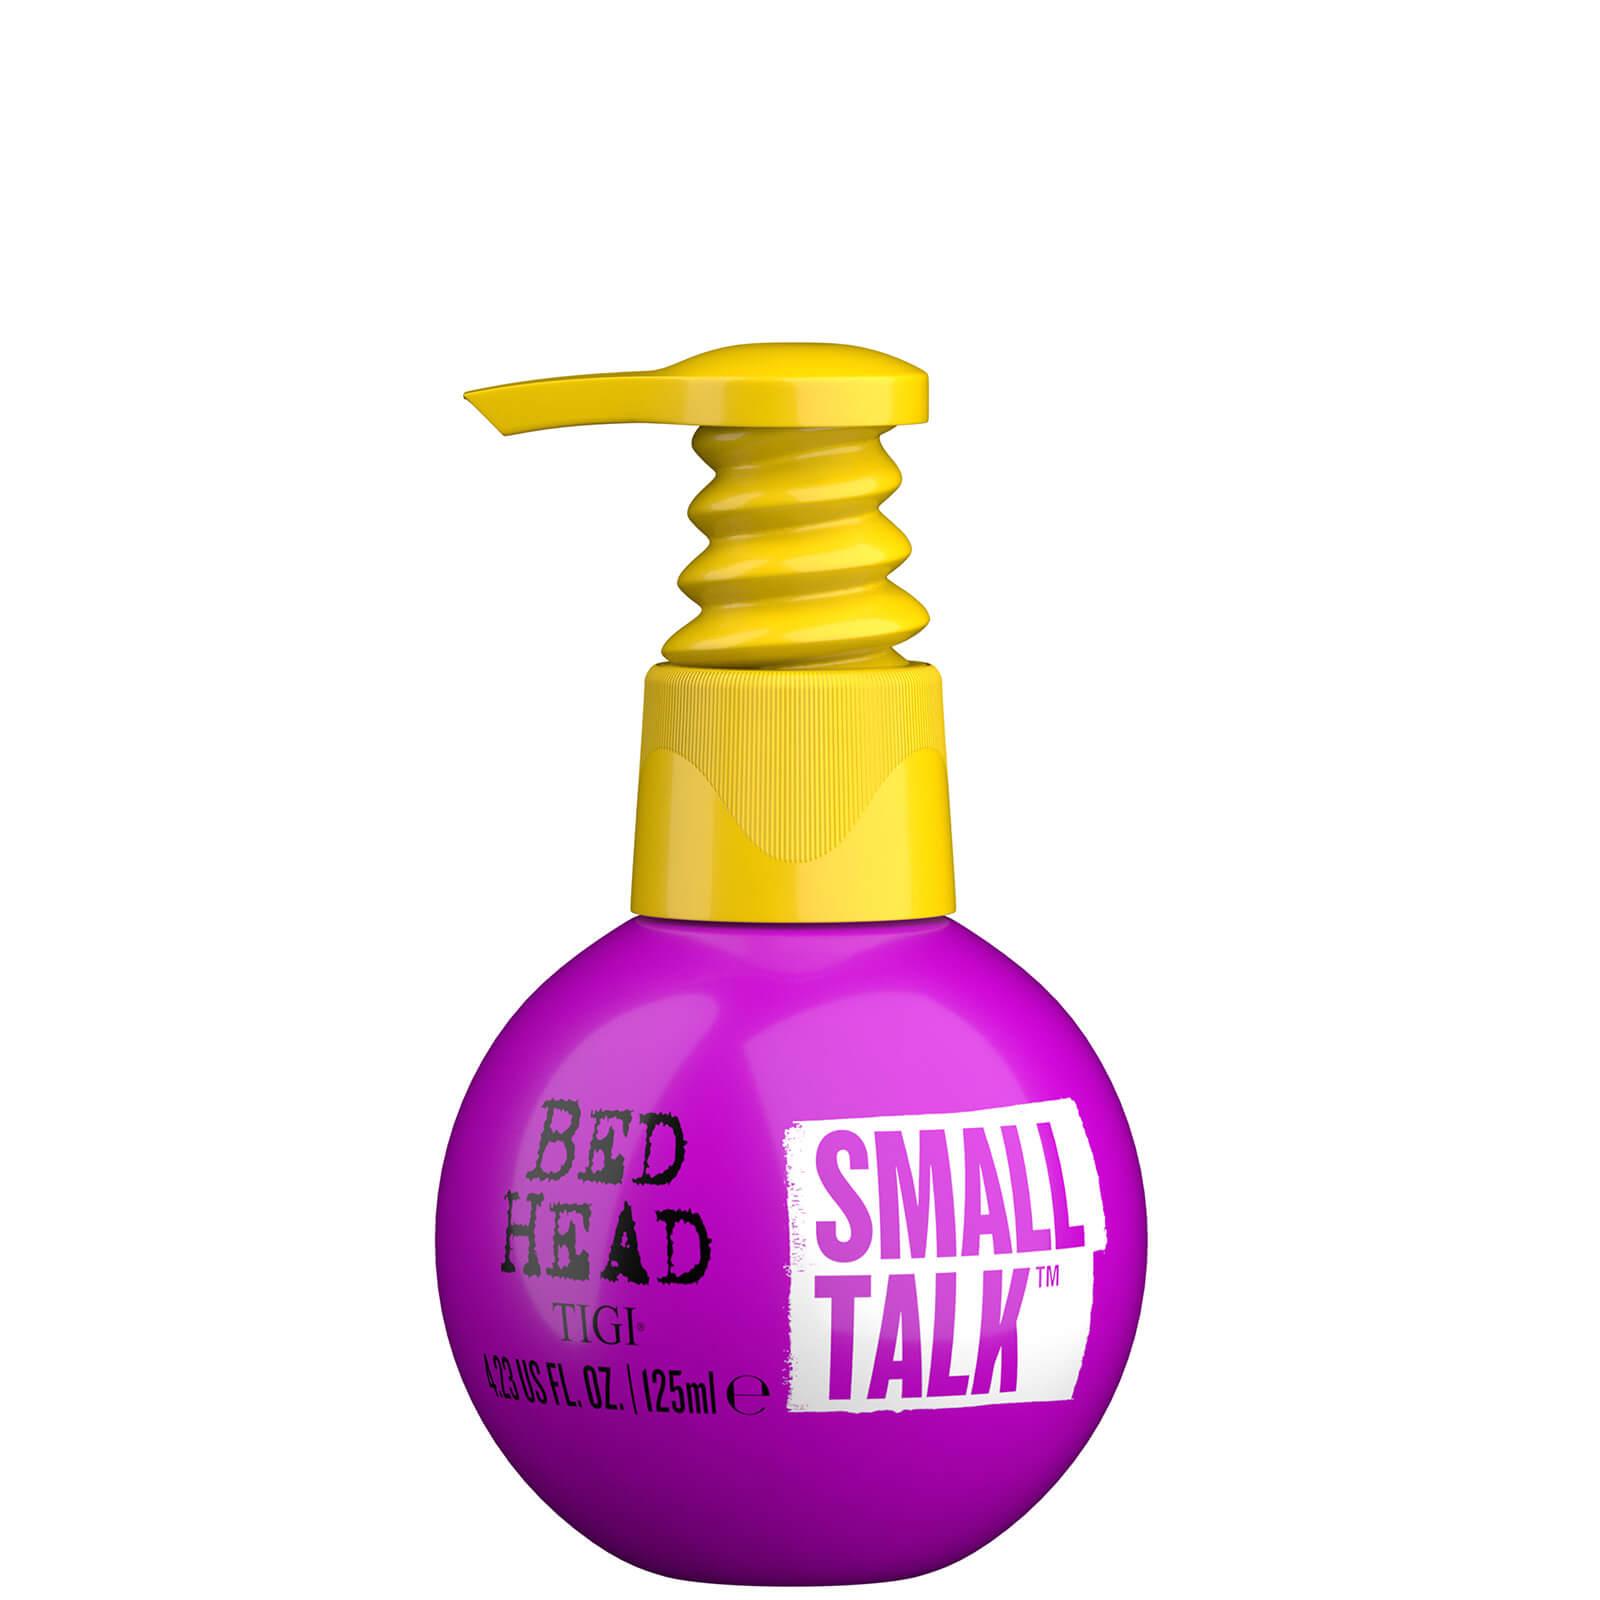 Image of TIGI Bed Head Small Talk Hair Thickening Cream for Fine Hair 125ml